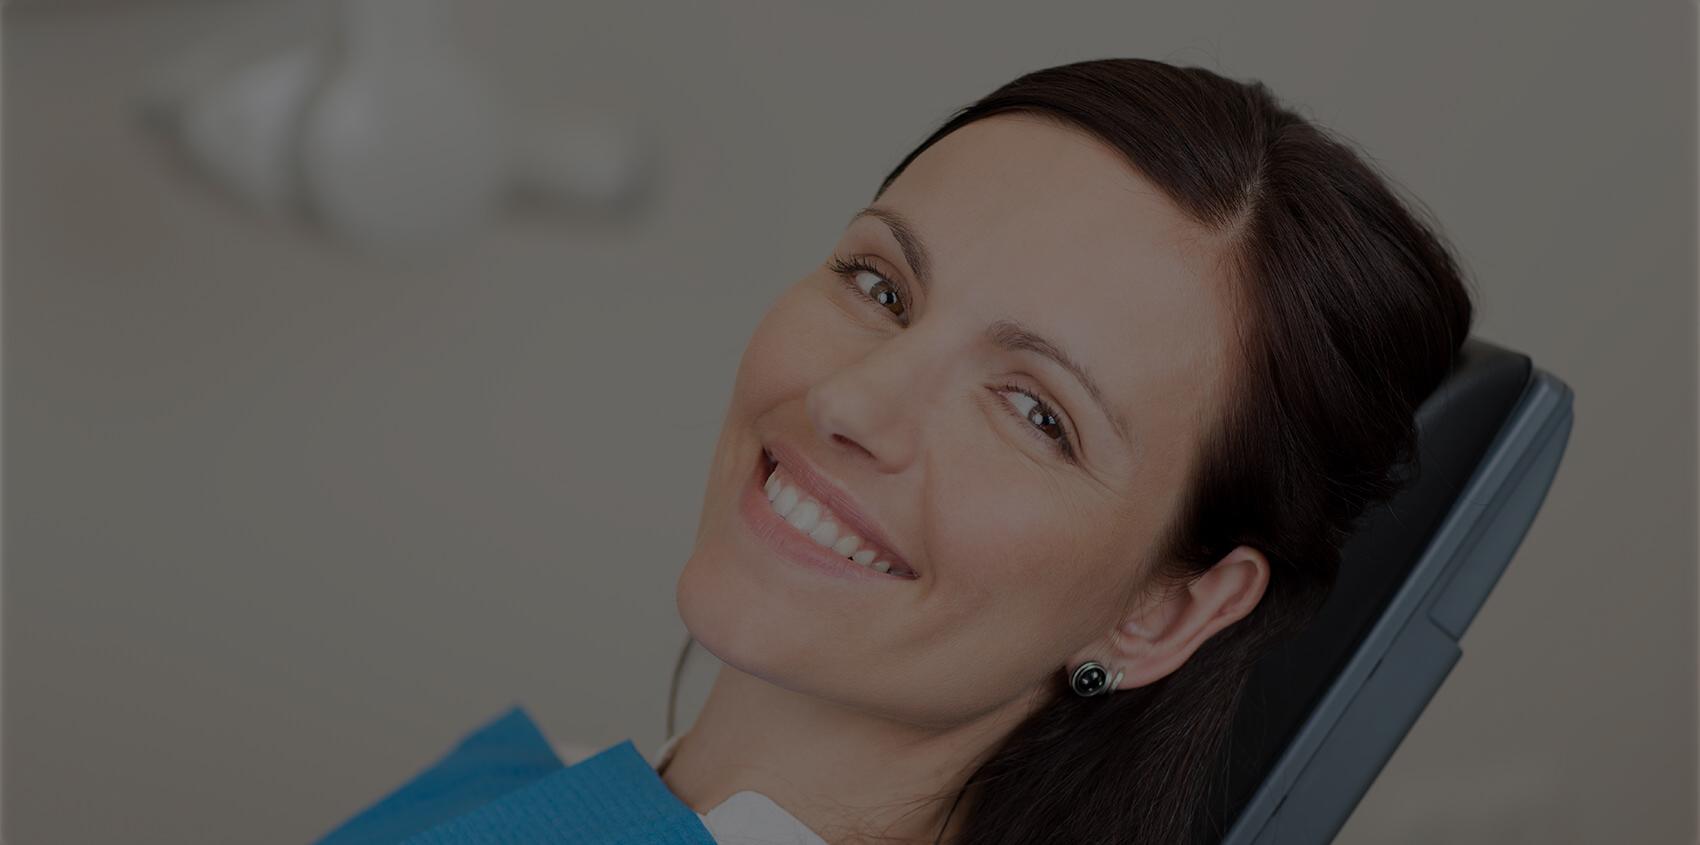 Restore damaged teeth with dental crown treatment in Salt Lake City